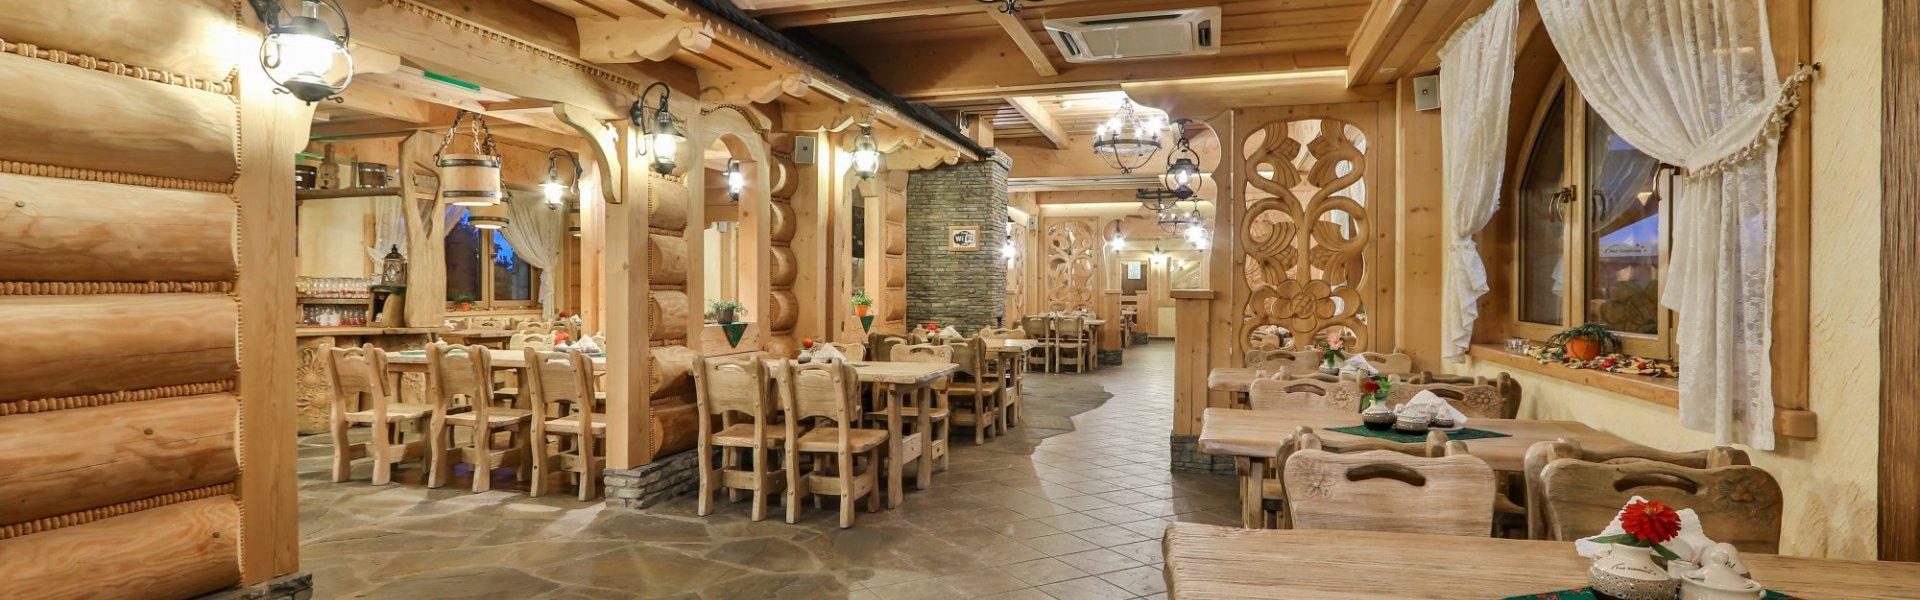 Regional restaurant